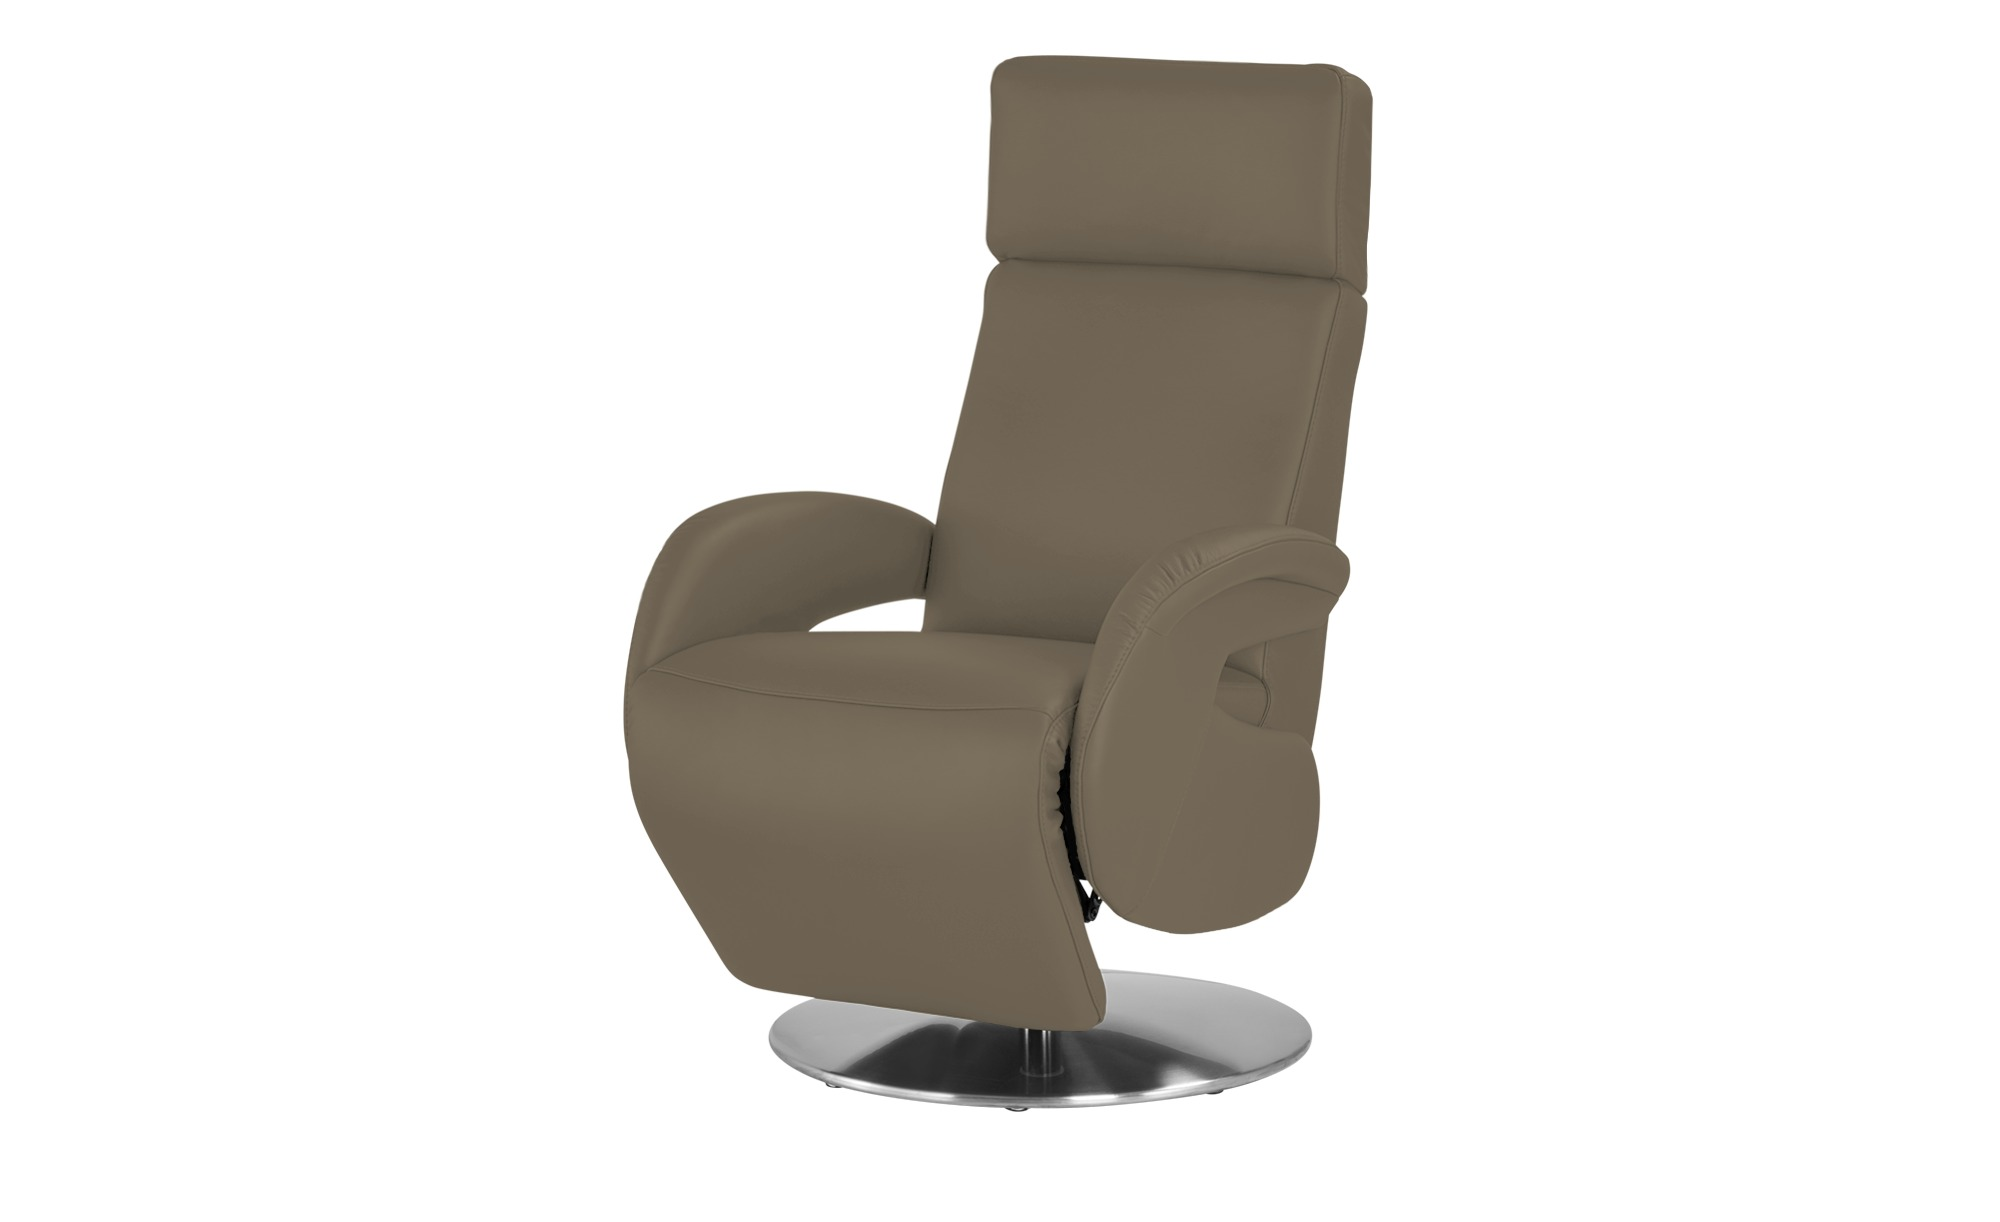 Leder-Relaxsessel braun - Leder Varioso ¦ braun ¦ Maße (cm): B: 76 H: 118 T: 86 Polstermöbel > Sessel > Fernsehsessel - Höffner